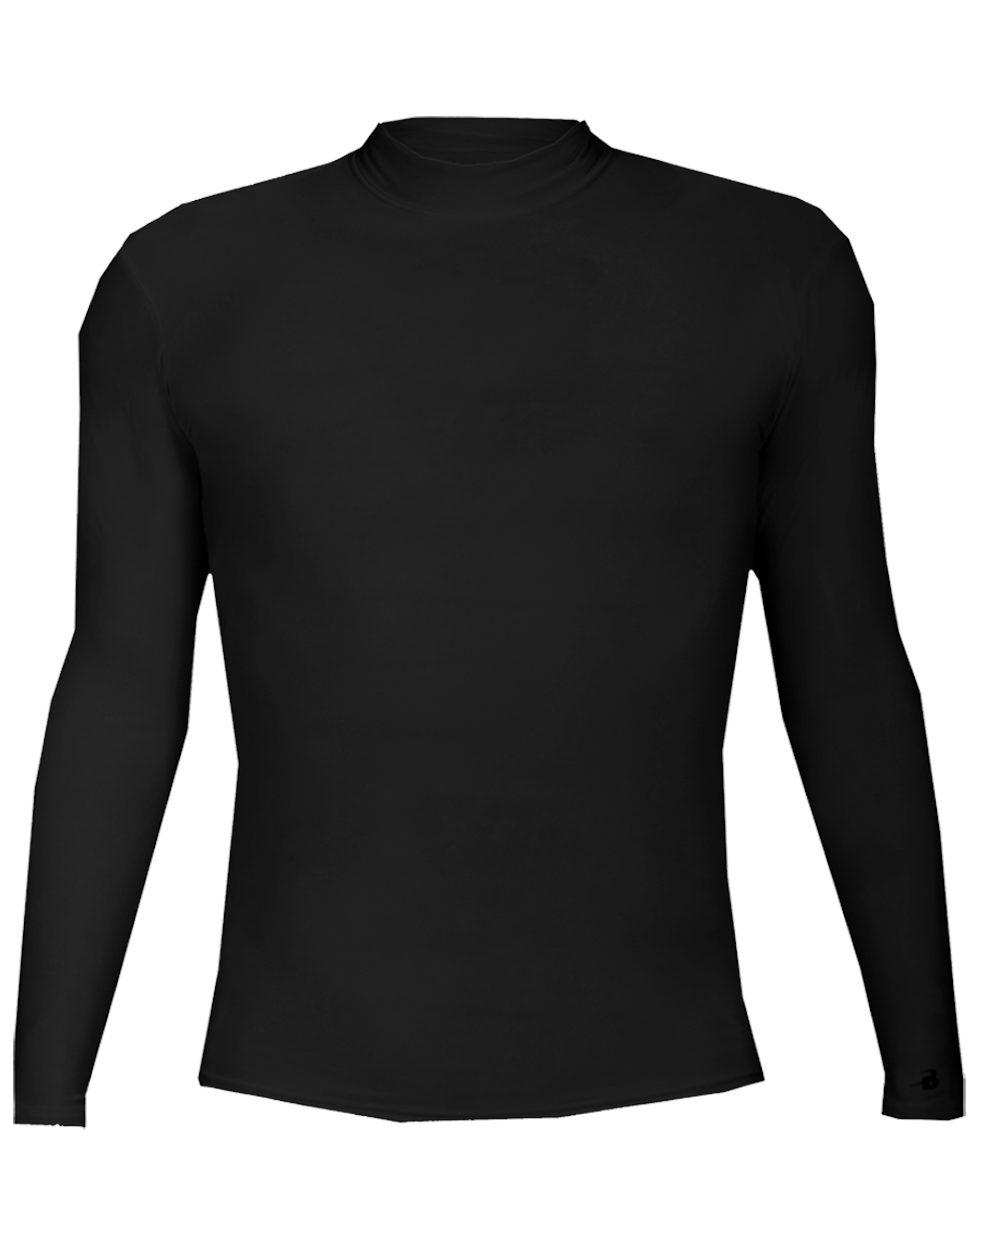 Badger B-Hot Long Sleeve Compression Shirt 4756